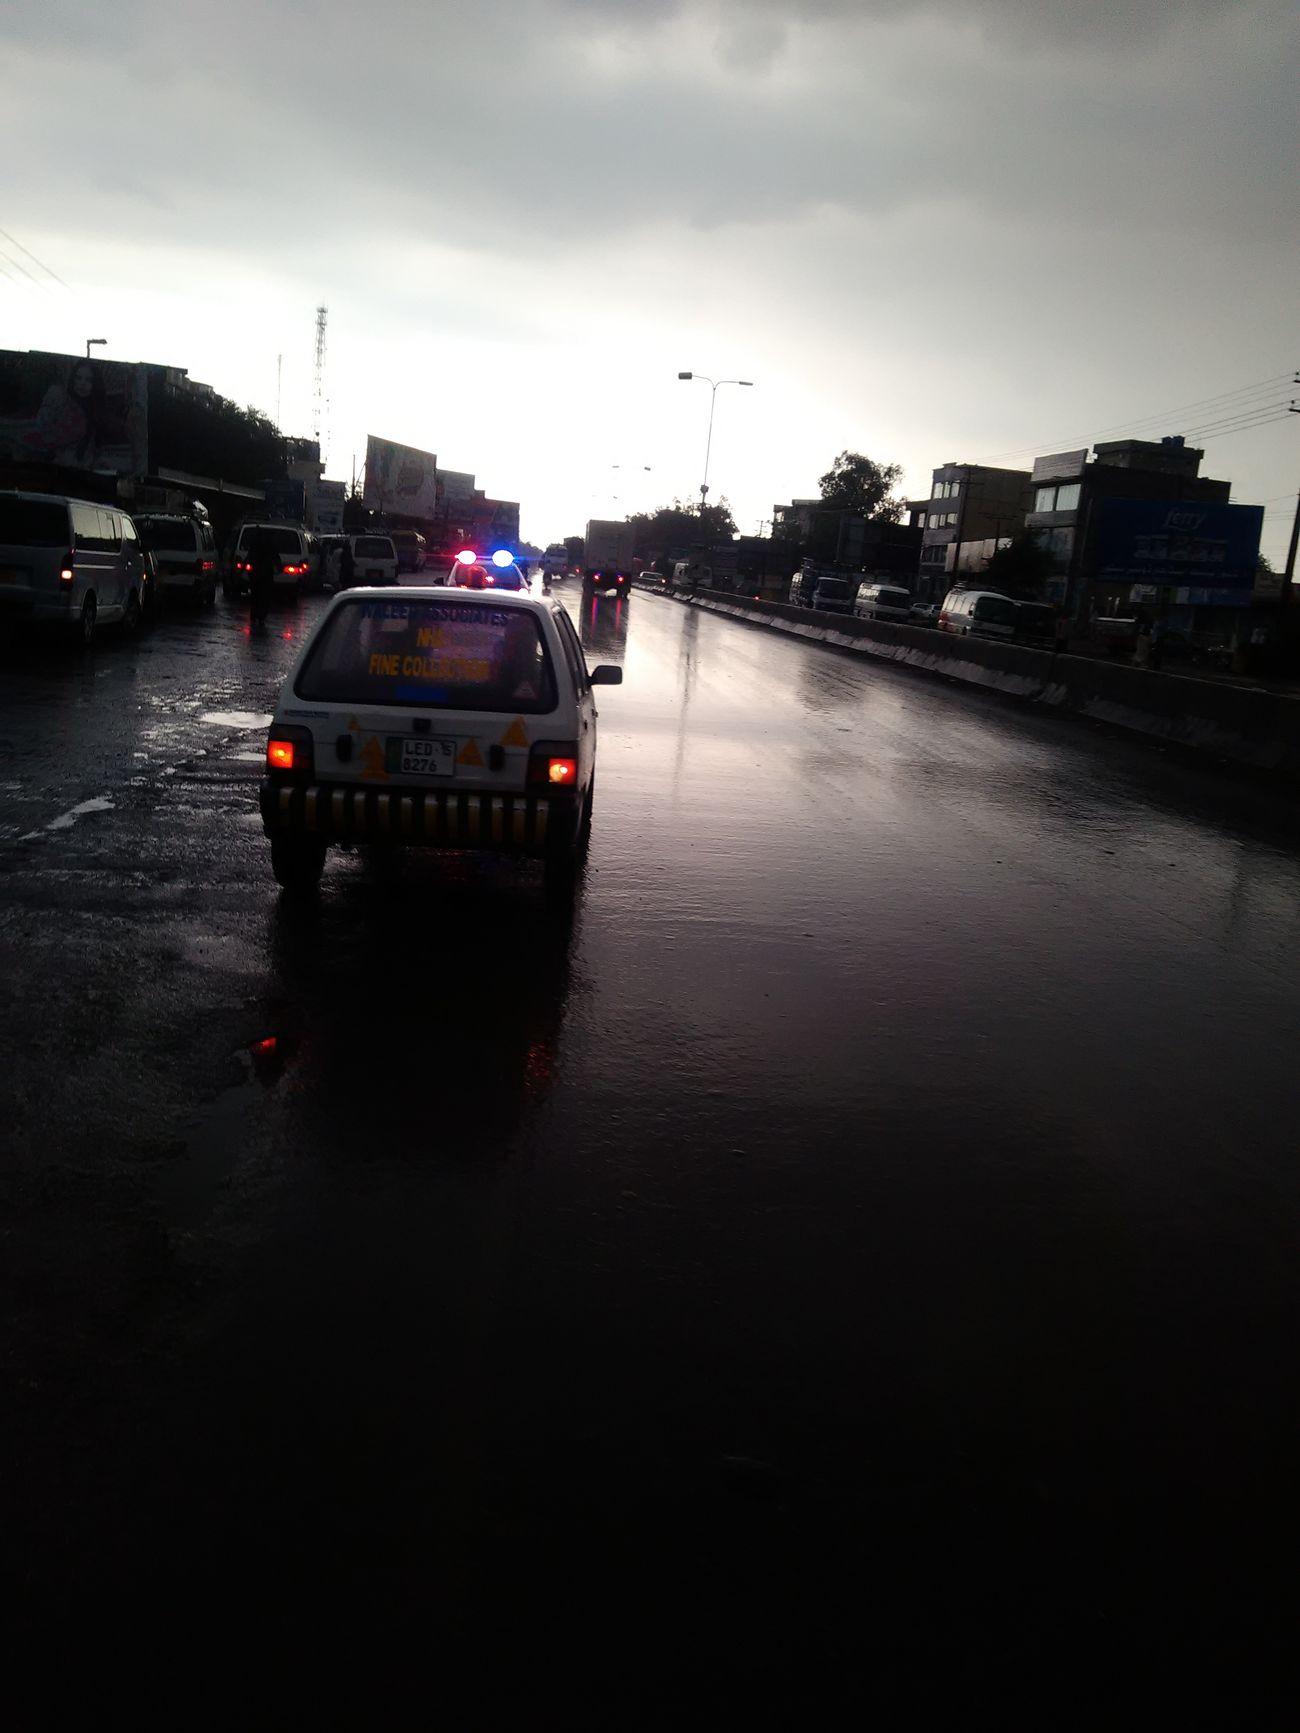 Morning Raining City Pakistan Romanitcweather Beauty In Nature Water Traffic Traffic Police  First Eyeem Photo